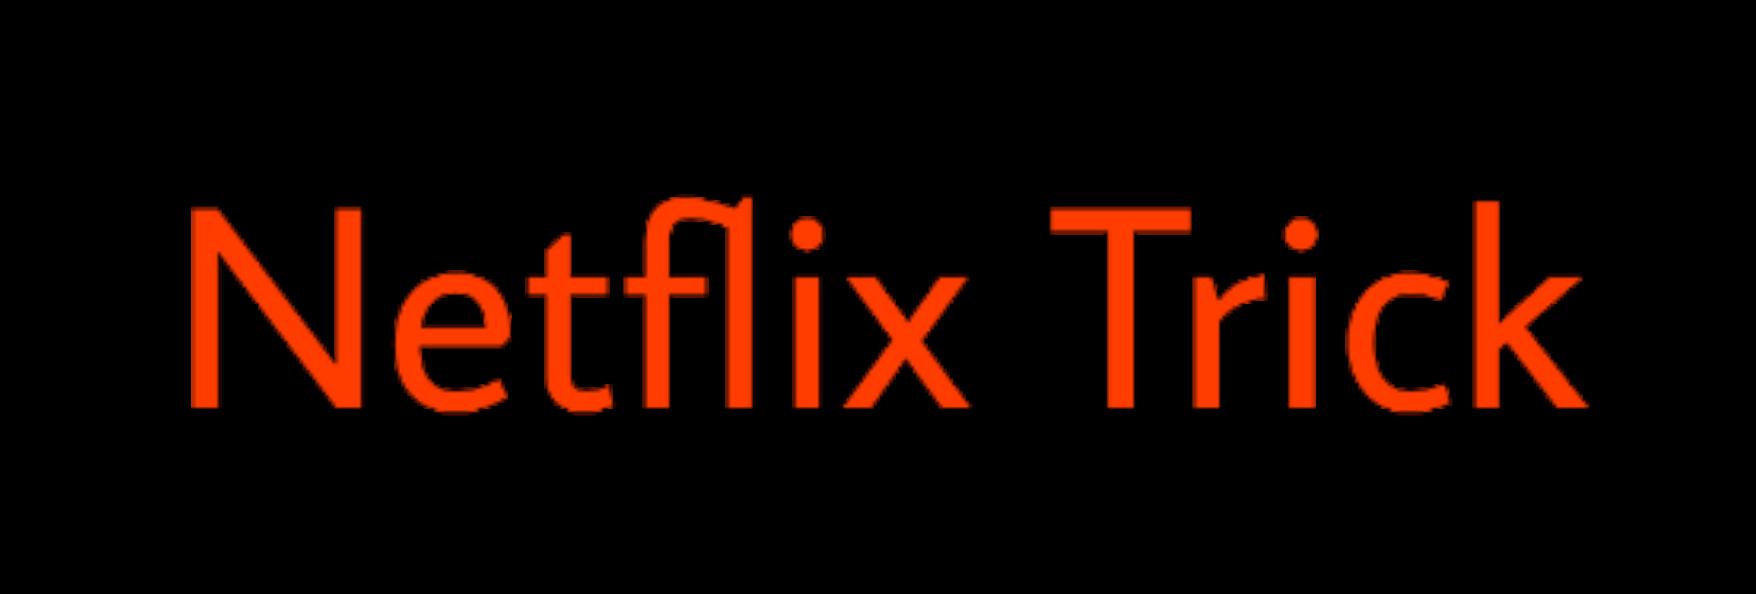 Netflixtrick Com Everything Is Here Netflix Account And Password Free Netflix Account Netflix Account